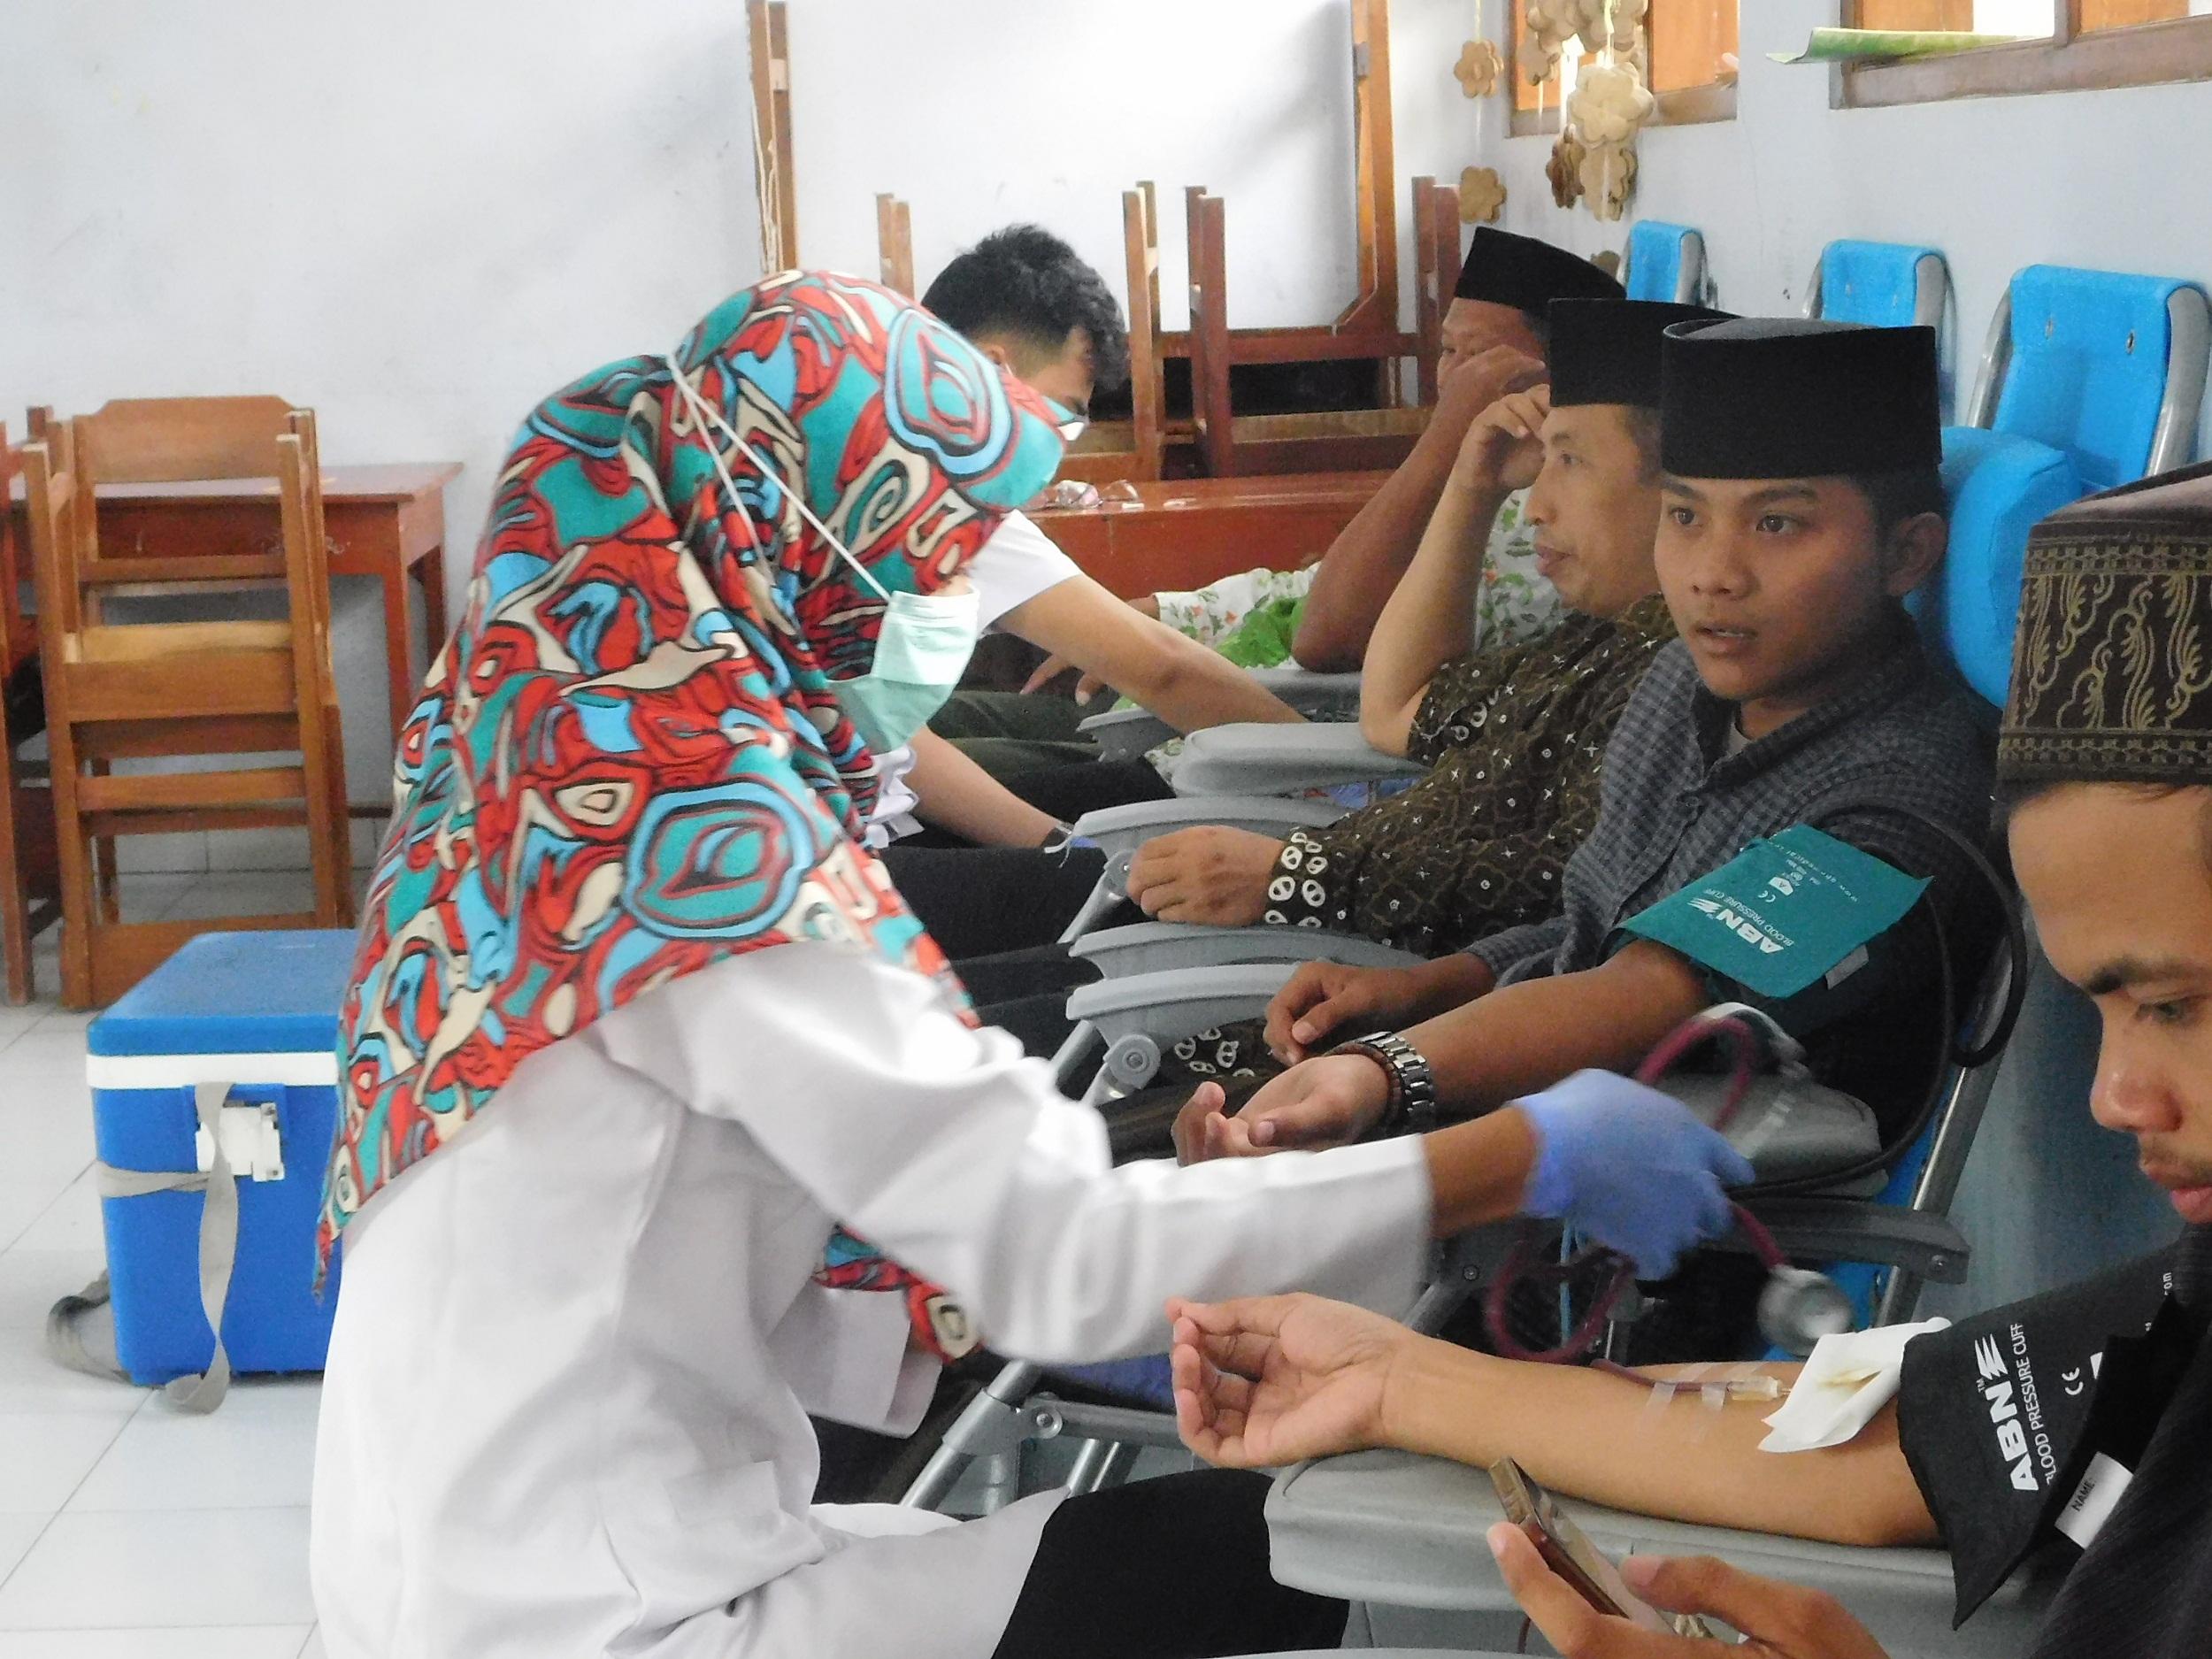 Tanamkan Nilai Kemanusiaan dengan Donor Darah